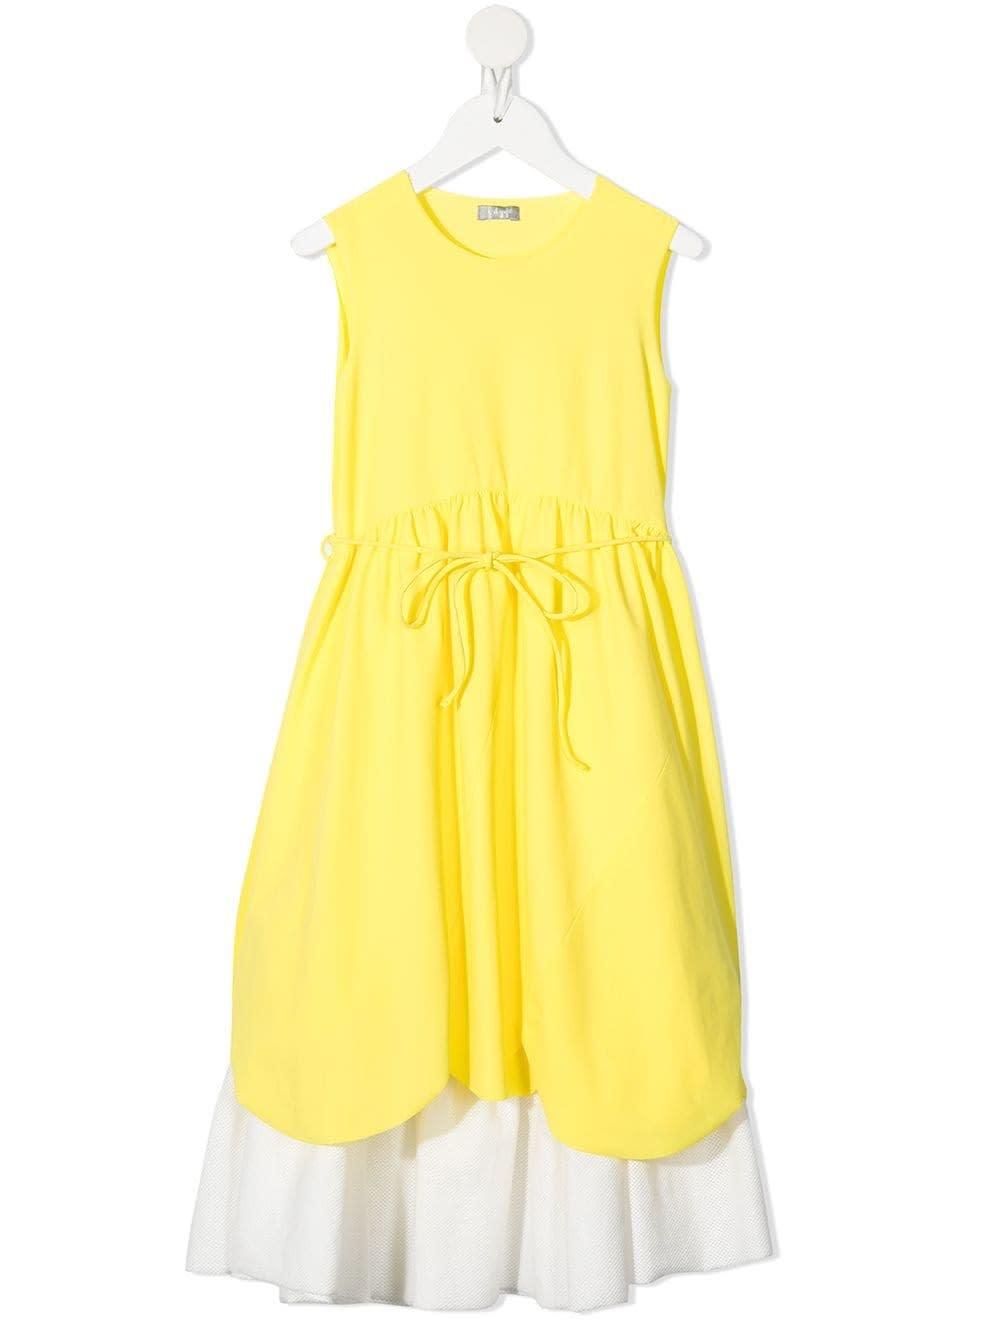 Il Gufo Dresses BICOLOR DRESS WITH DRAWSTRING